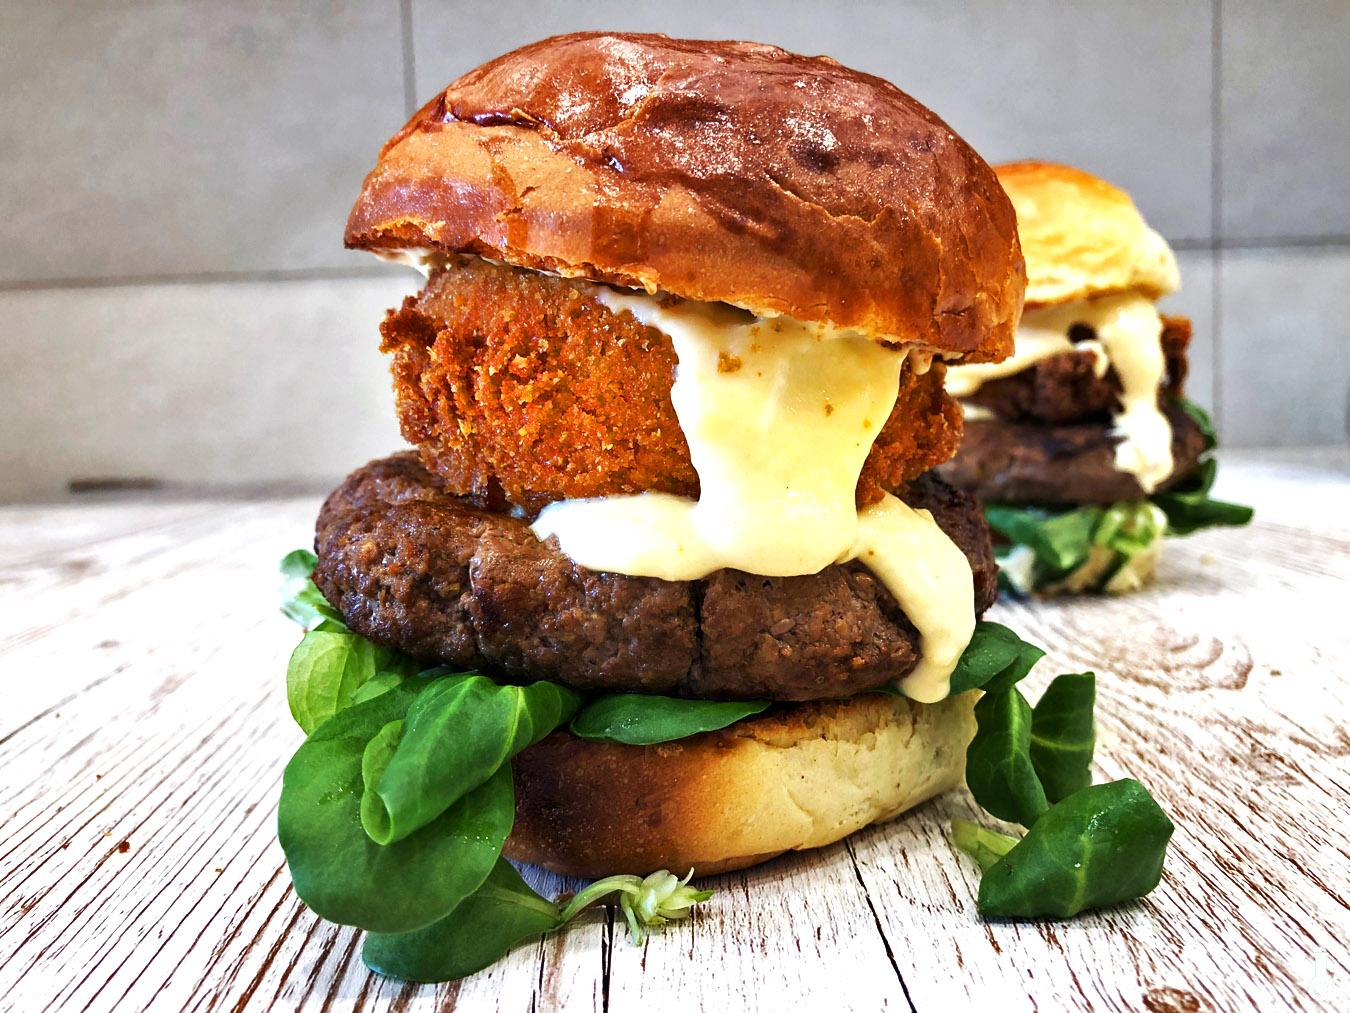 https://www.stonerchef.pl/wp-content/uploads/2018/05/sos-serowy-cieknacy-z-wulkano-burgera.jpg